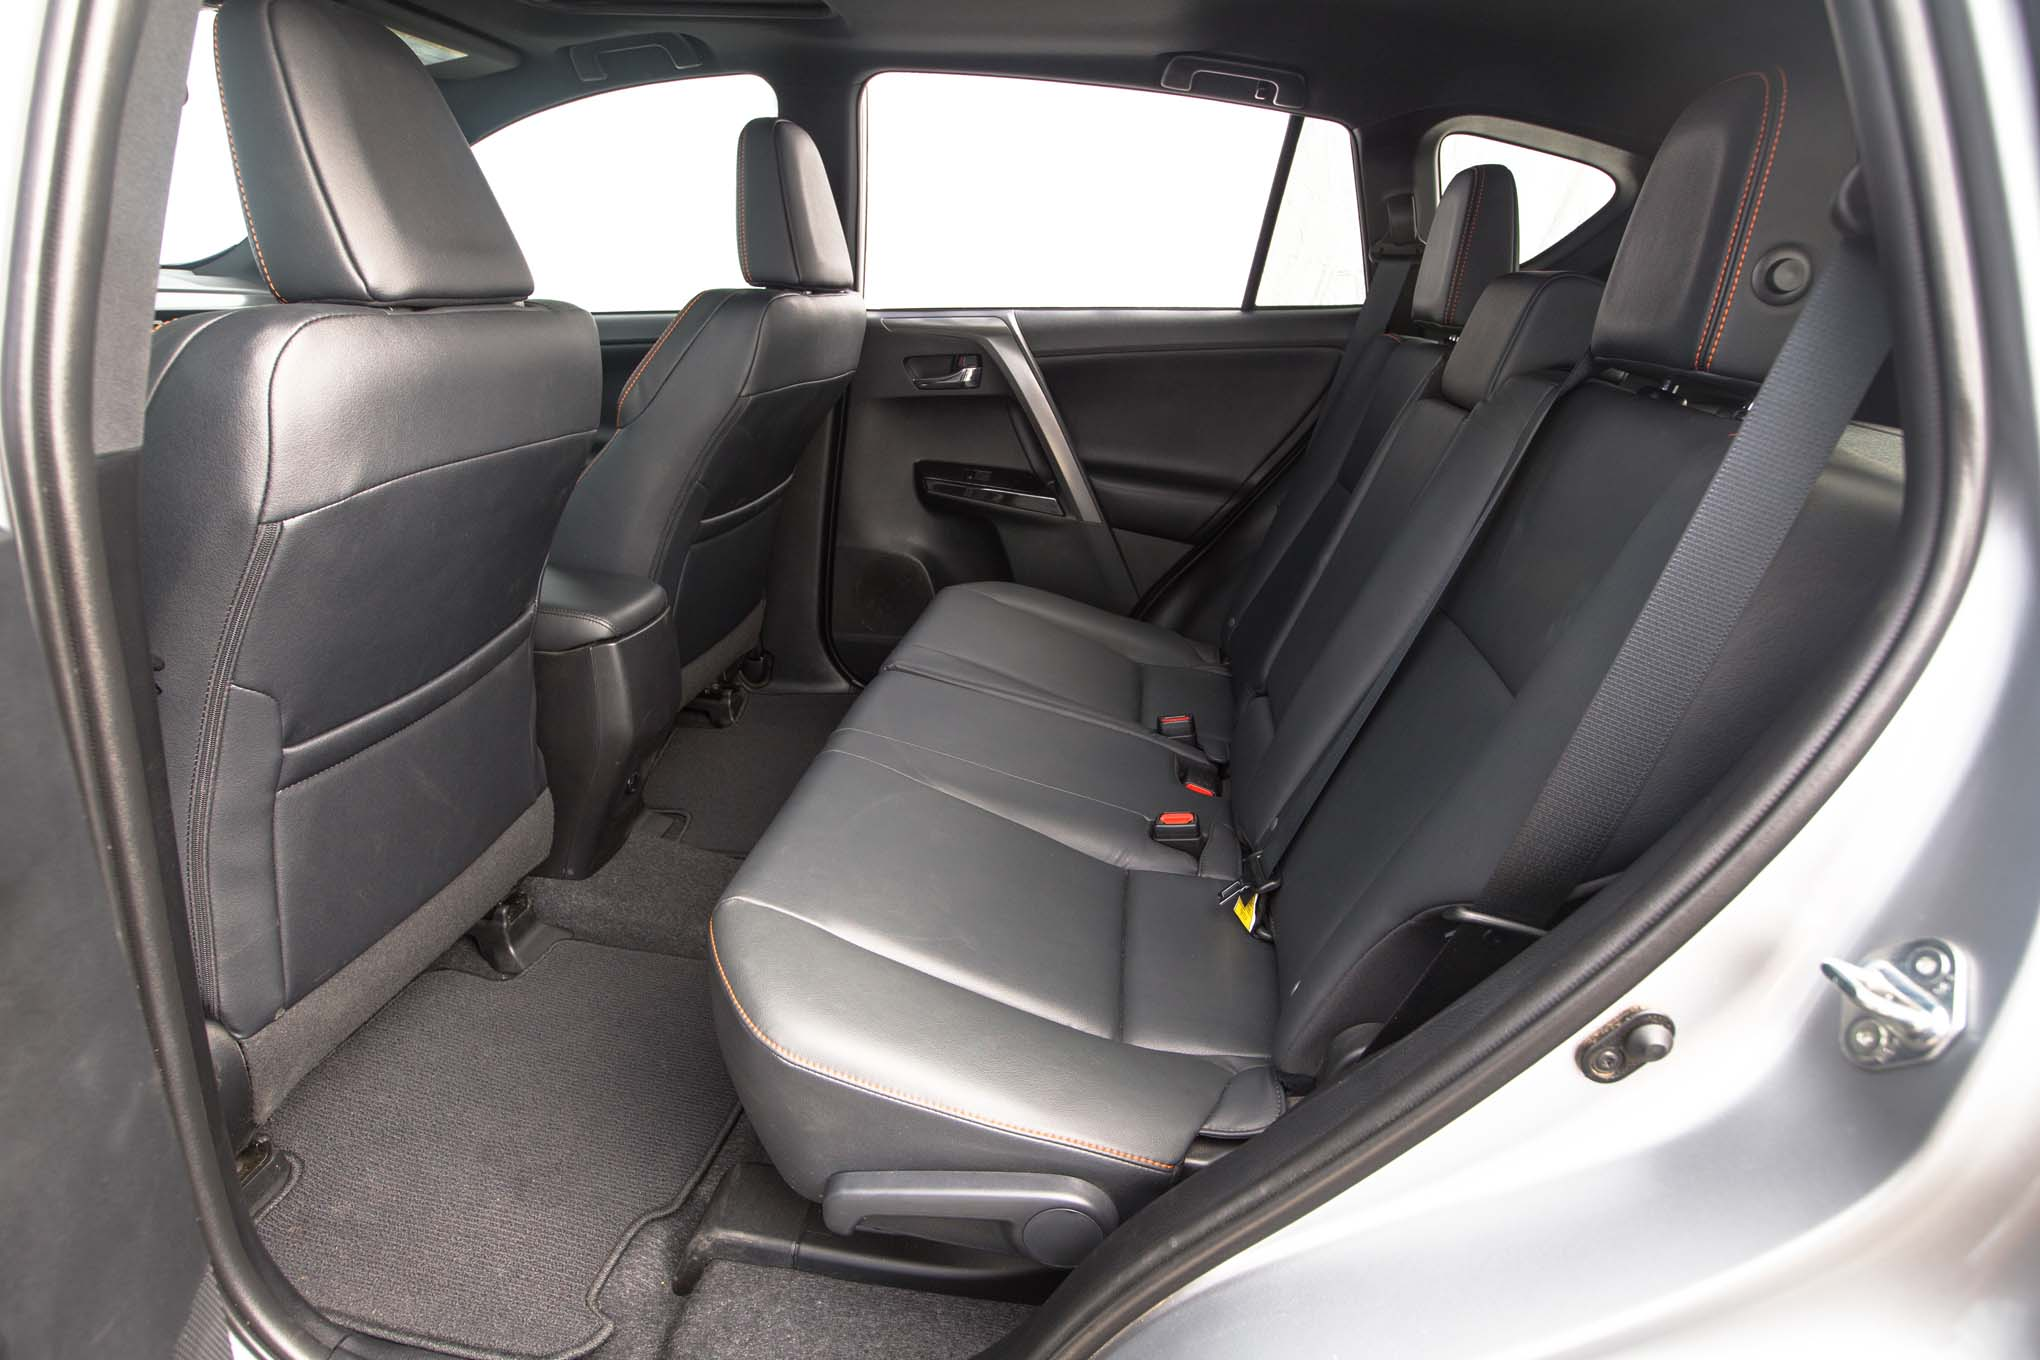 2016 Toyota RAV4 SE rear interior seats